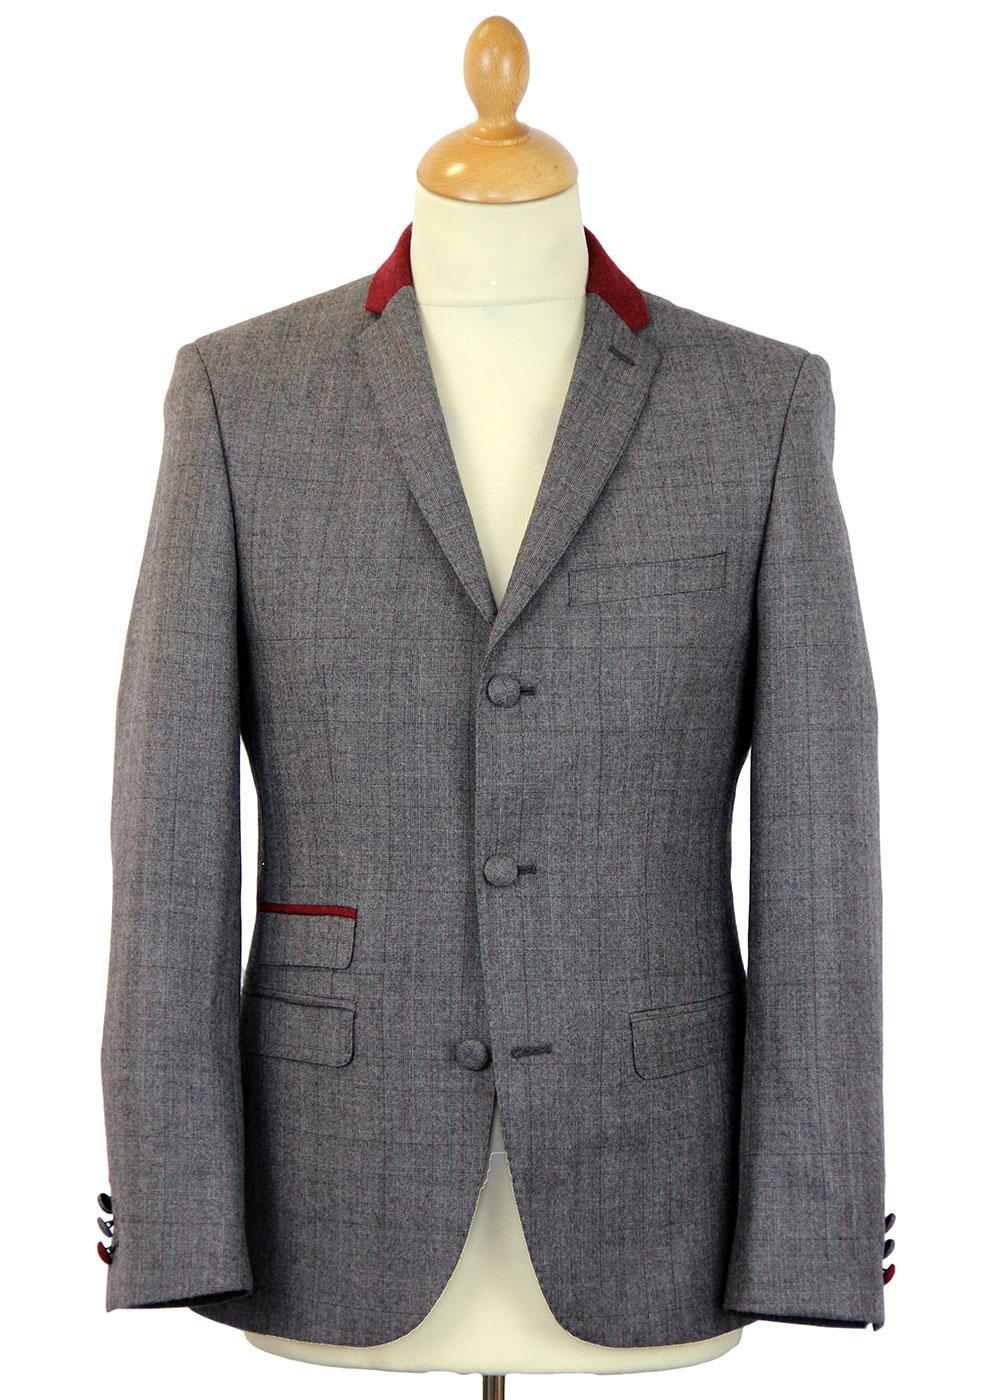 Redford MADCAP ENGLAND 3 Button Check Suit Jacket